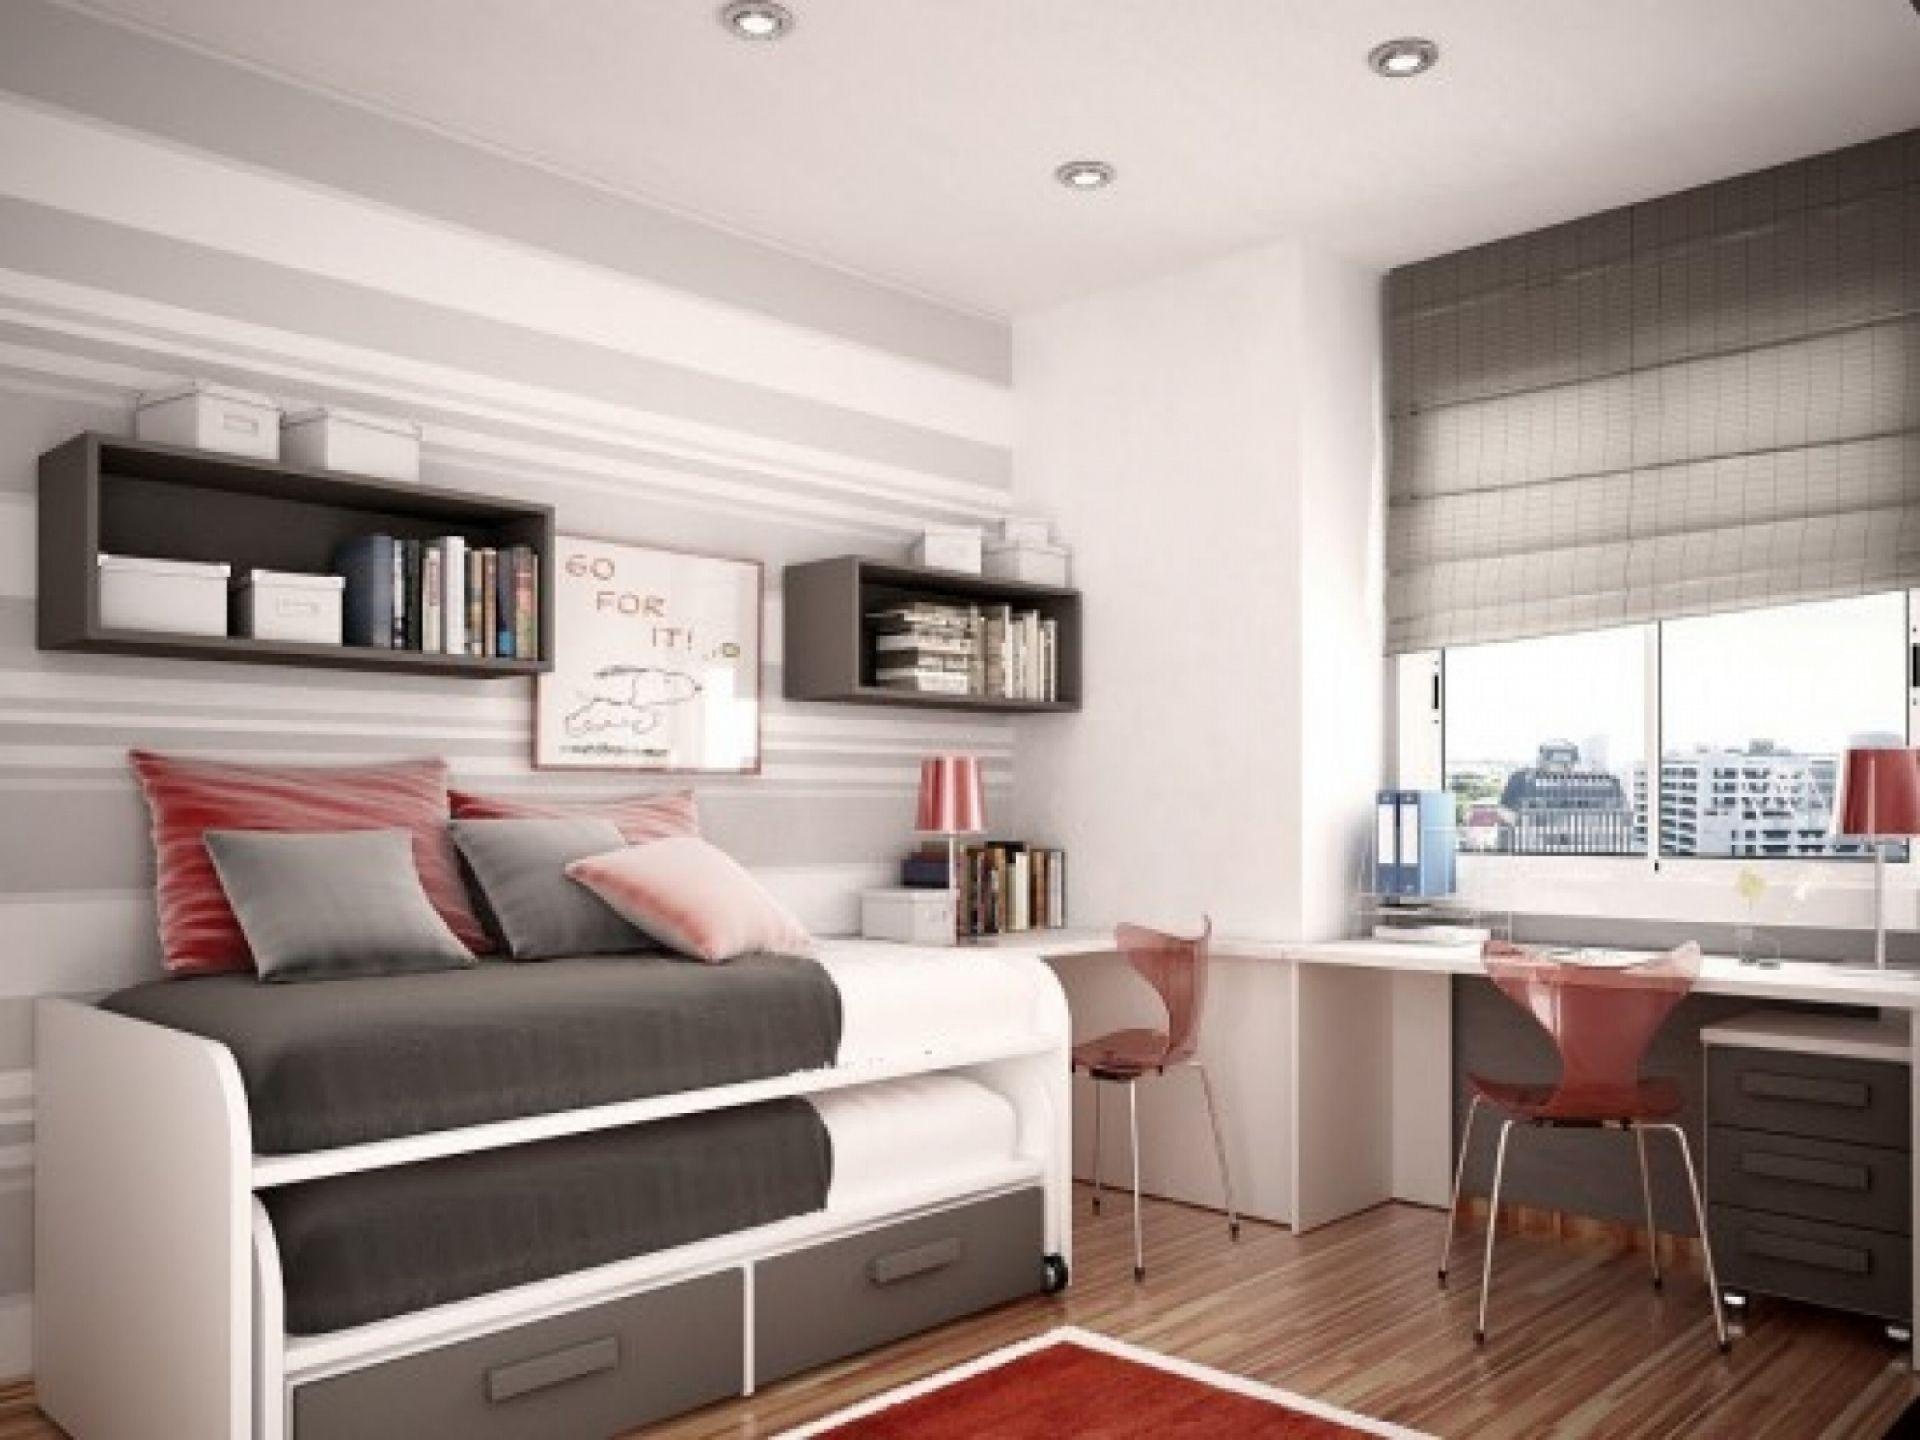 Boys Bedroom Design Ideas Grey Striped Wallpaper Ideas  Google Search  Study  Pinterest